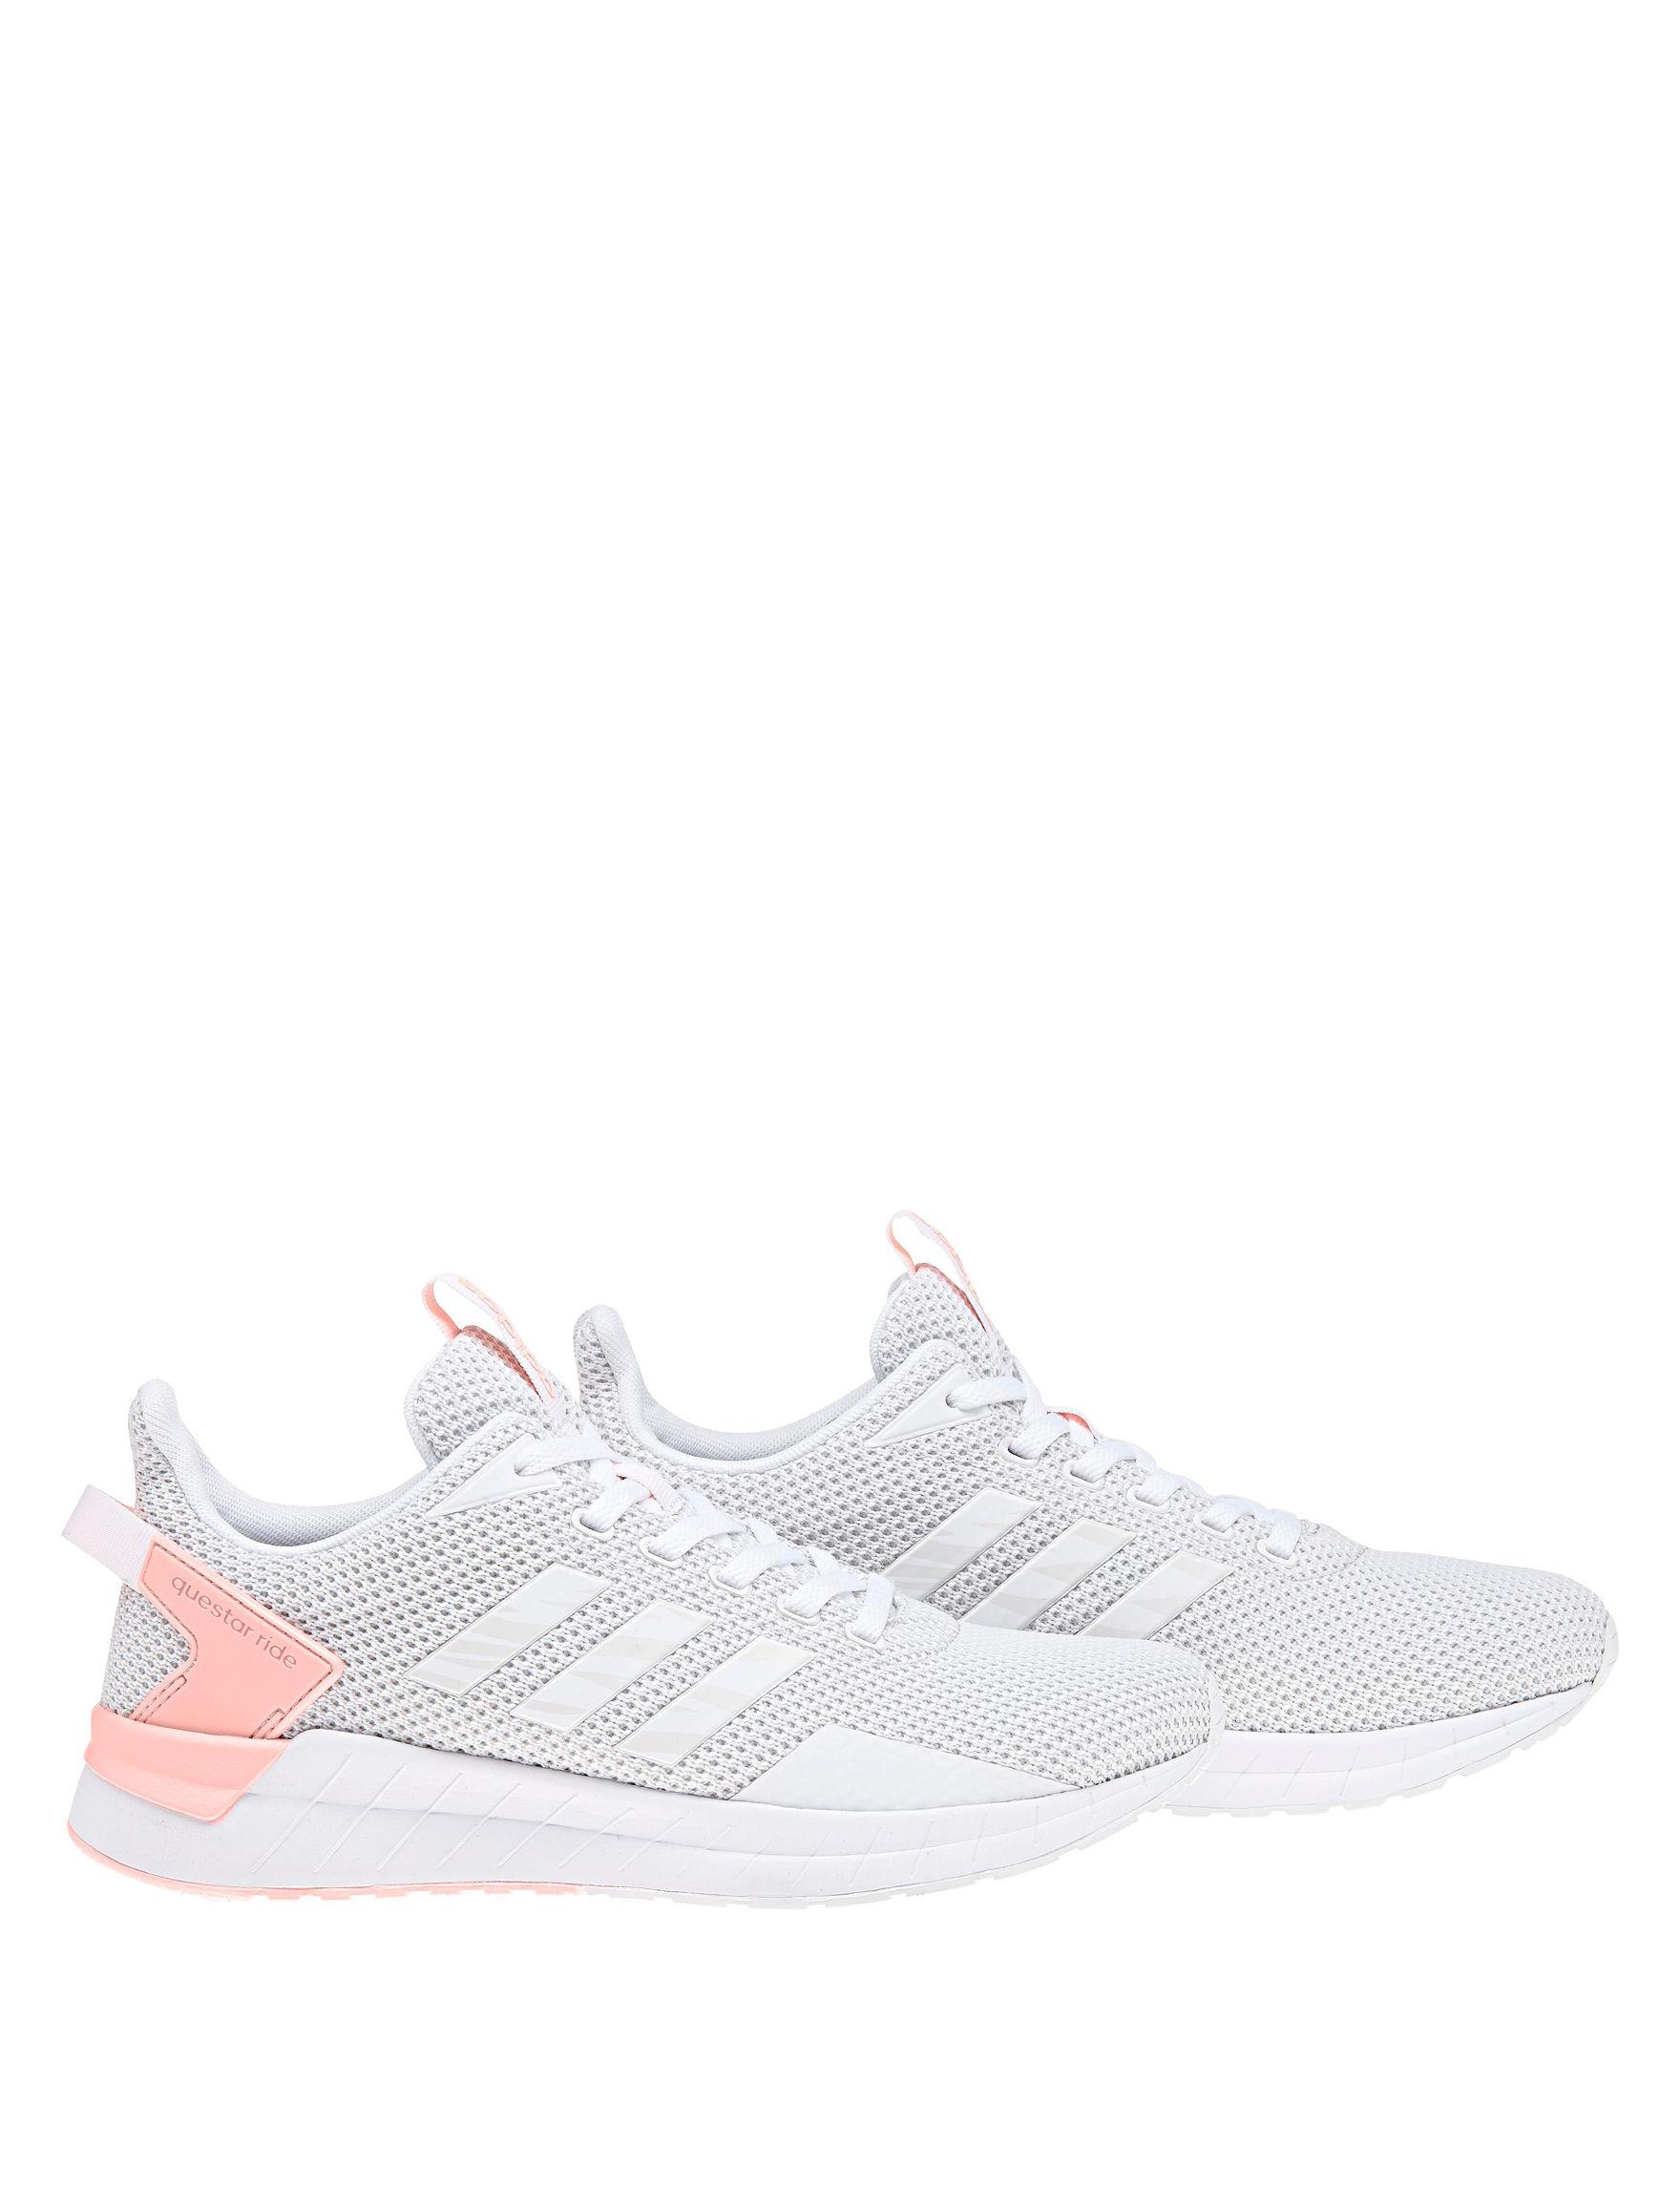 Adidas White / Coral